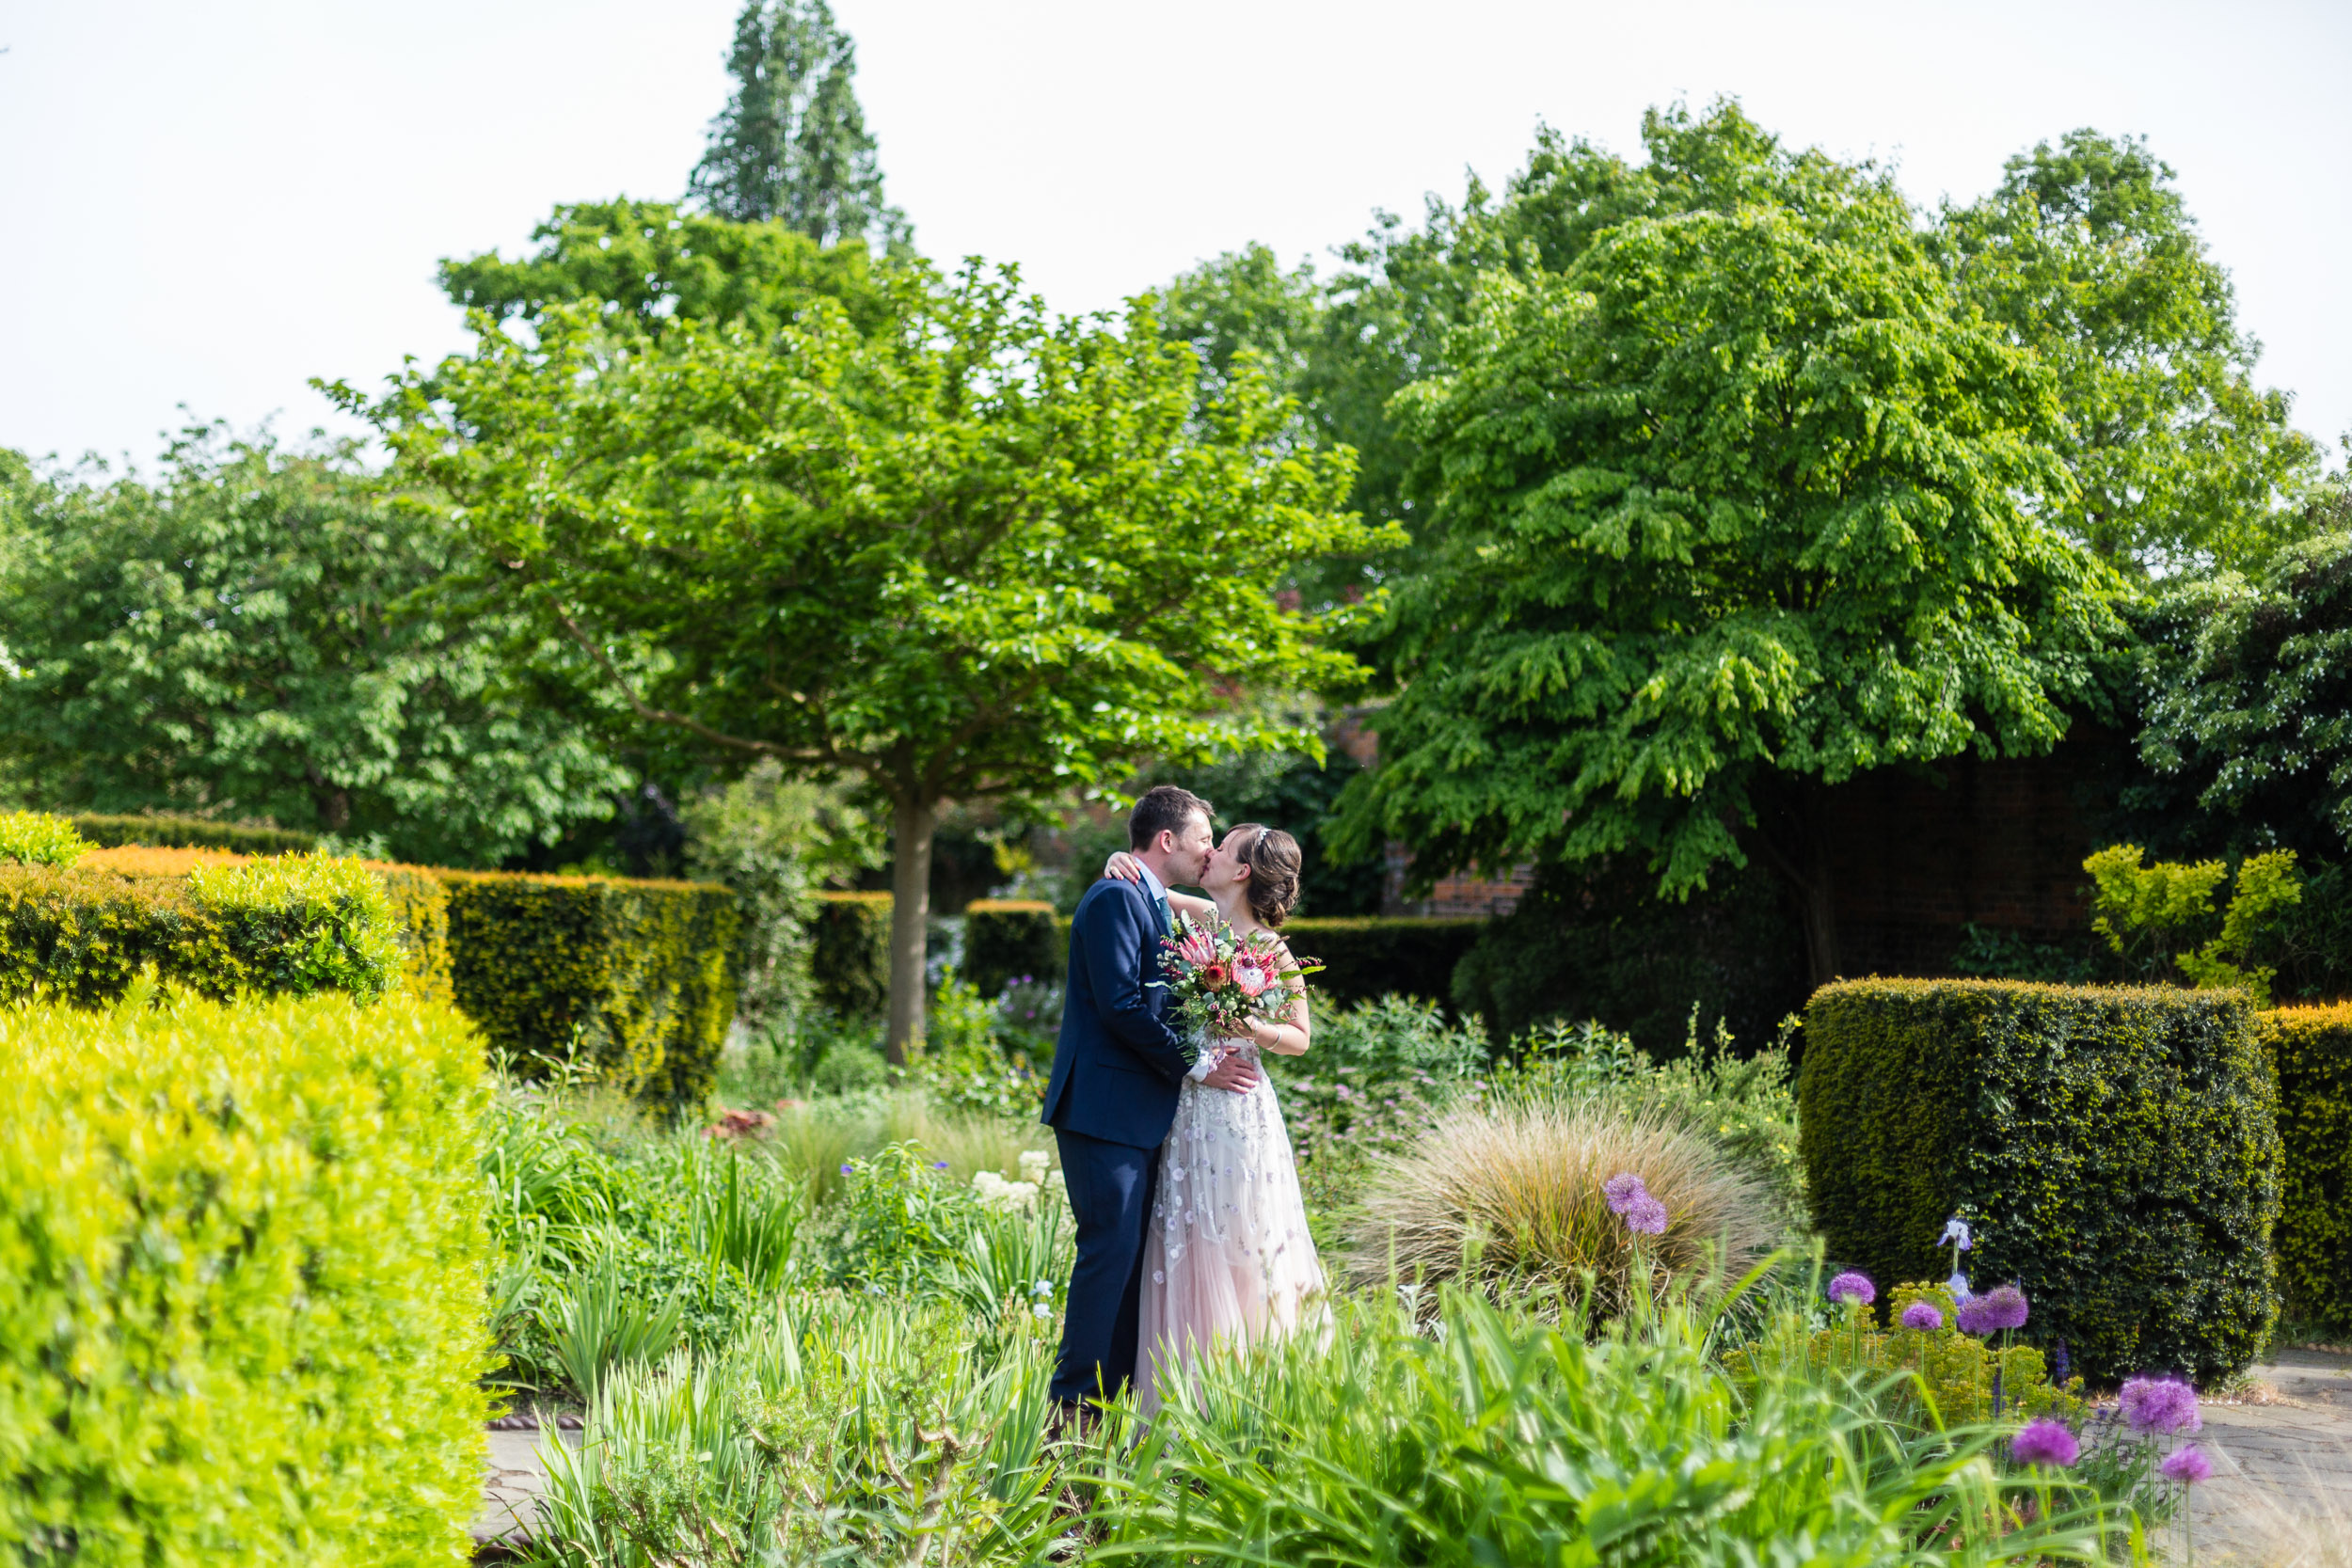 brockwell-lido-brixton-herne-hill-wedding-275.jpg